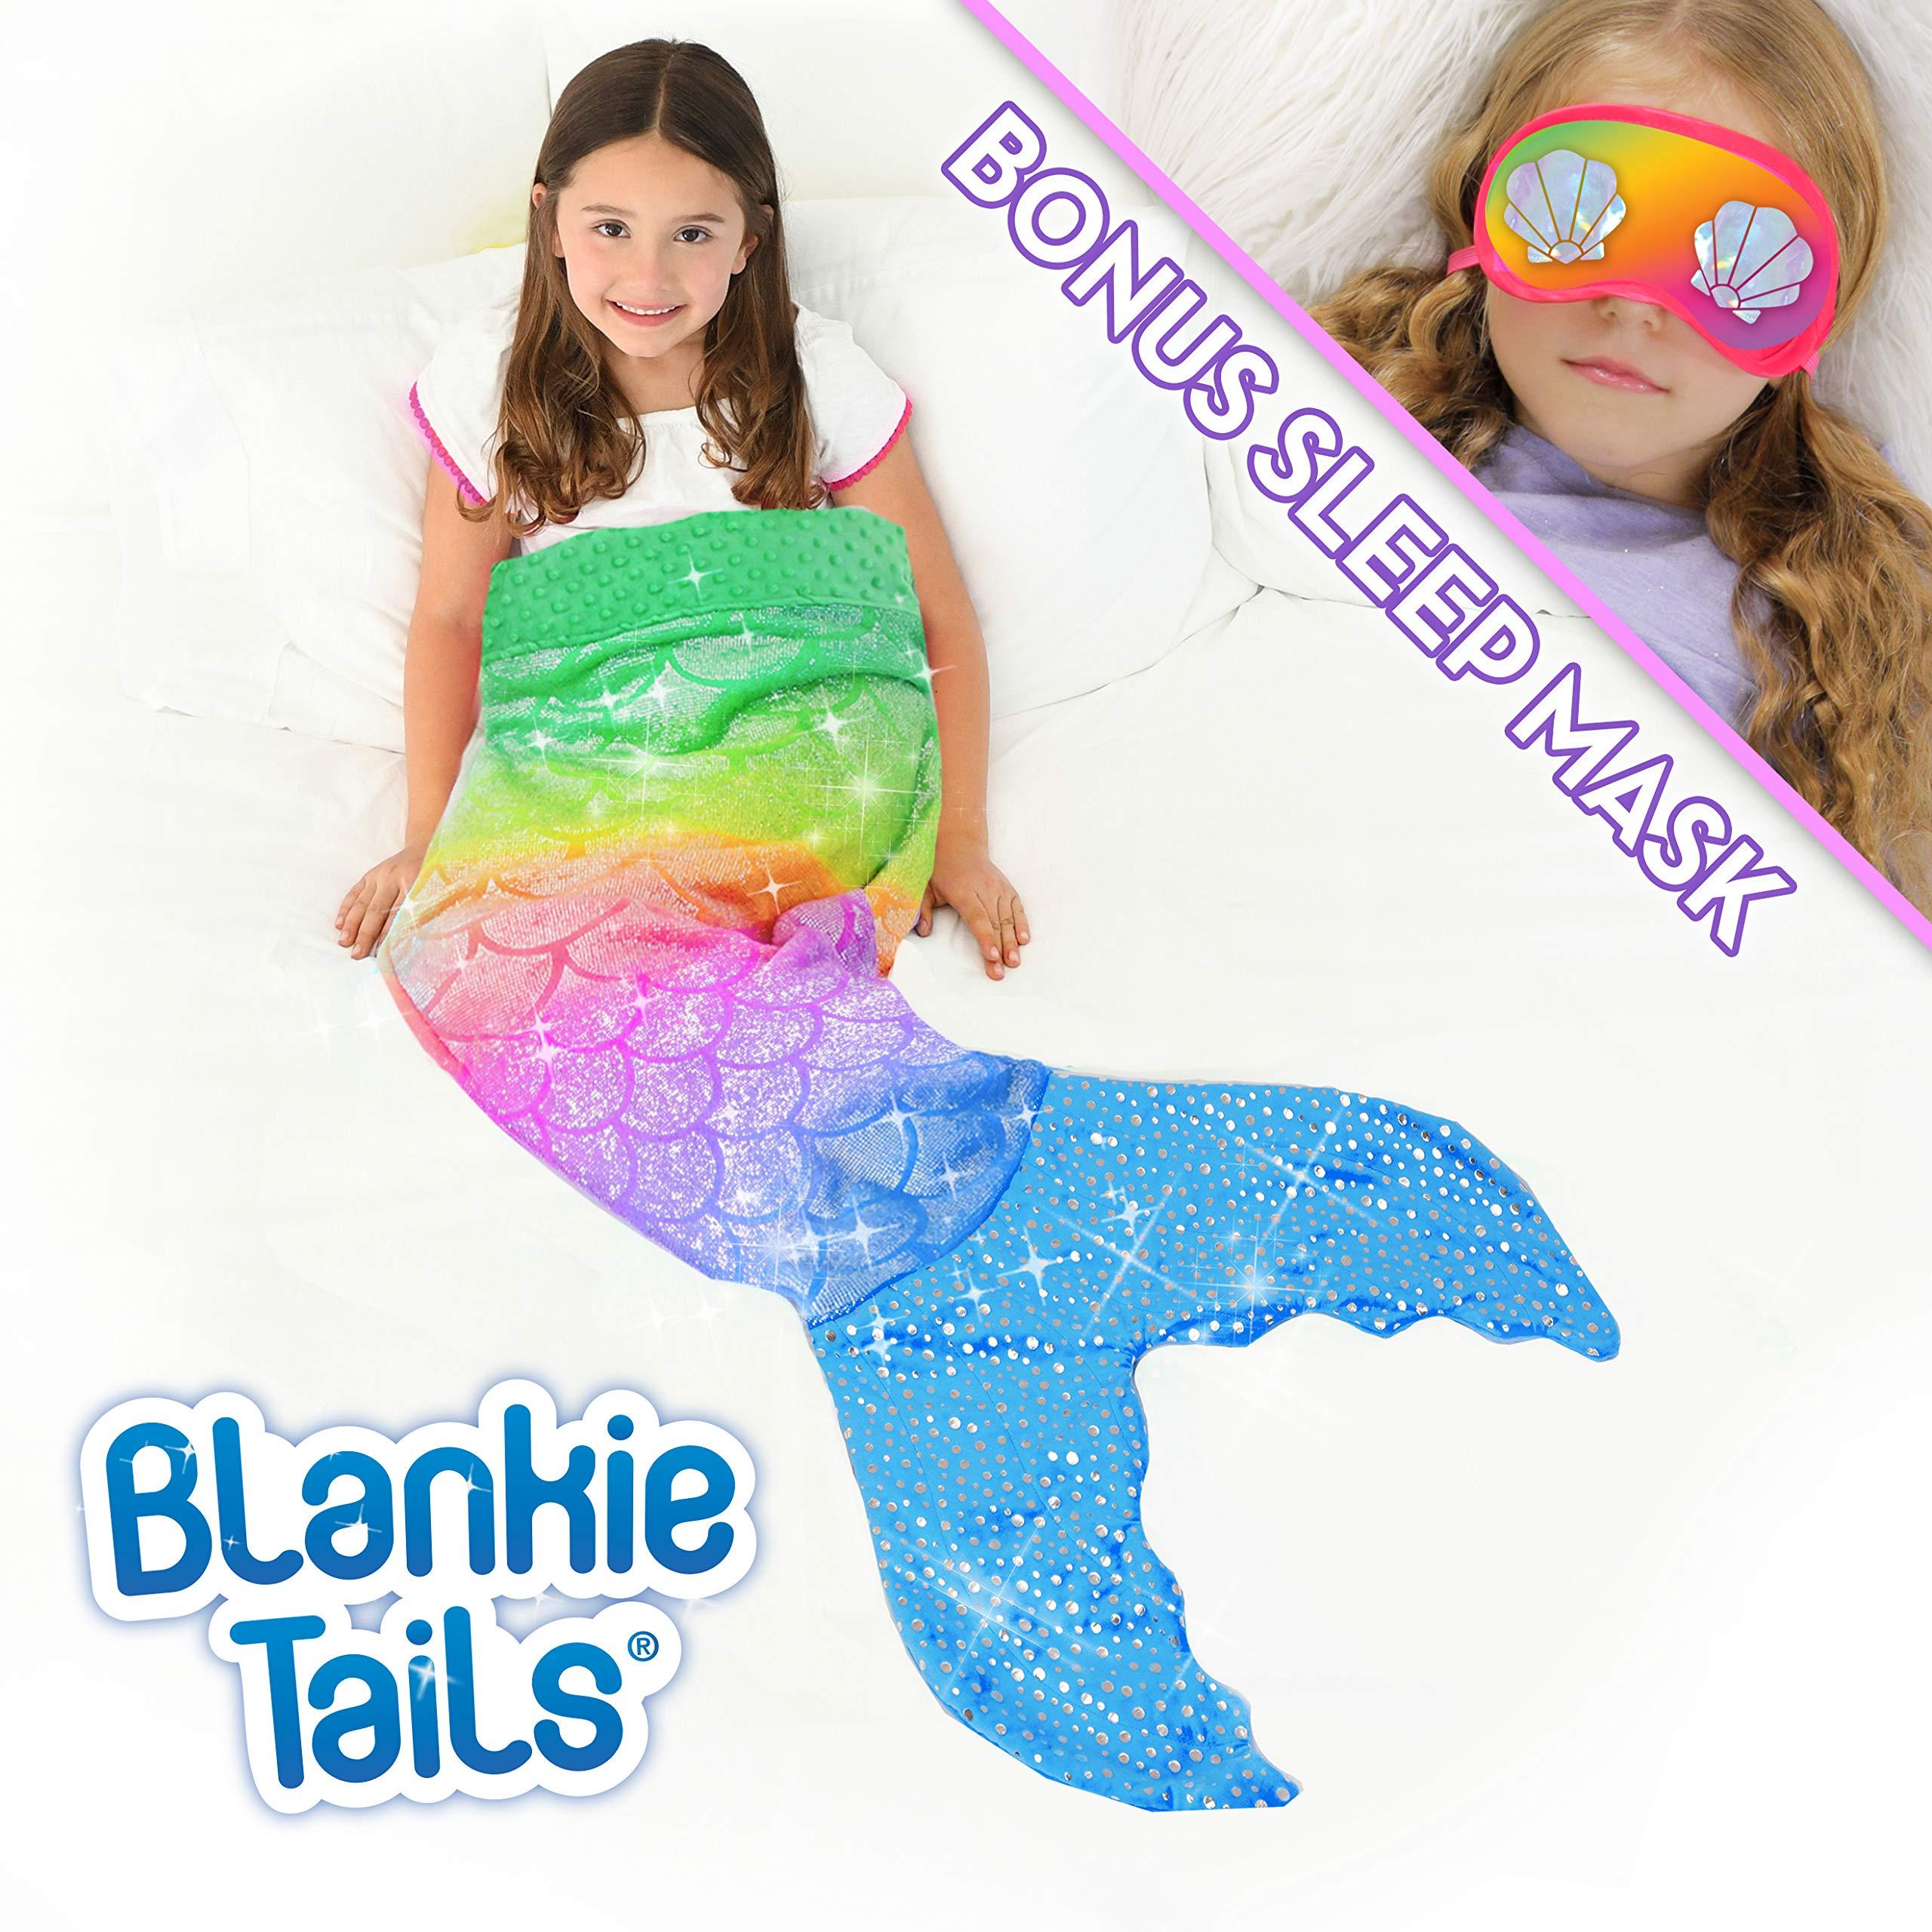 Blankie Tails Mermaid Tail Blanket with Bonus Sleep Mask Gift Set - Glitter Sparkle Rainbow Ombre Mermaid Blanket-Double-Sided Minky Fleece Kids Size Mermaid Tail Wearable Blanket by Blankie Tails